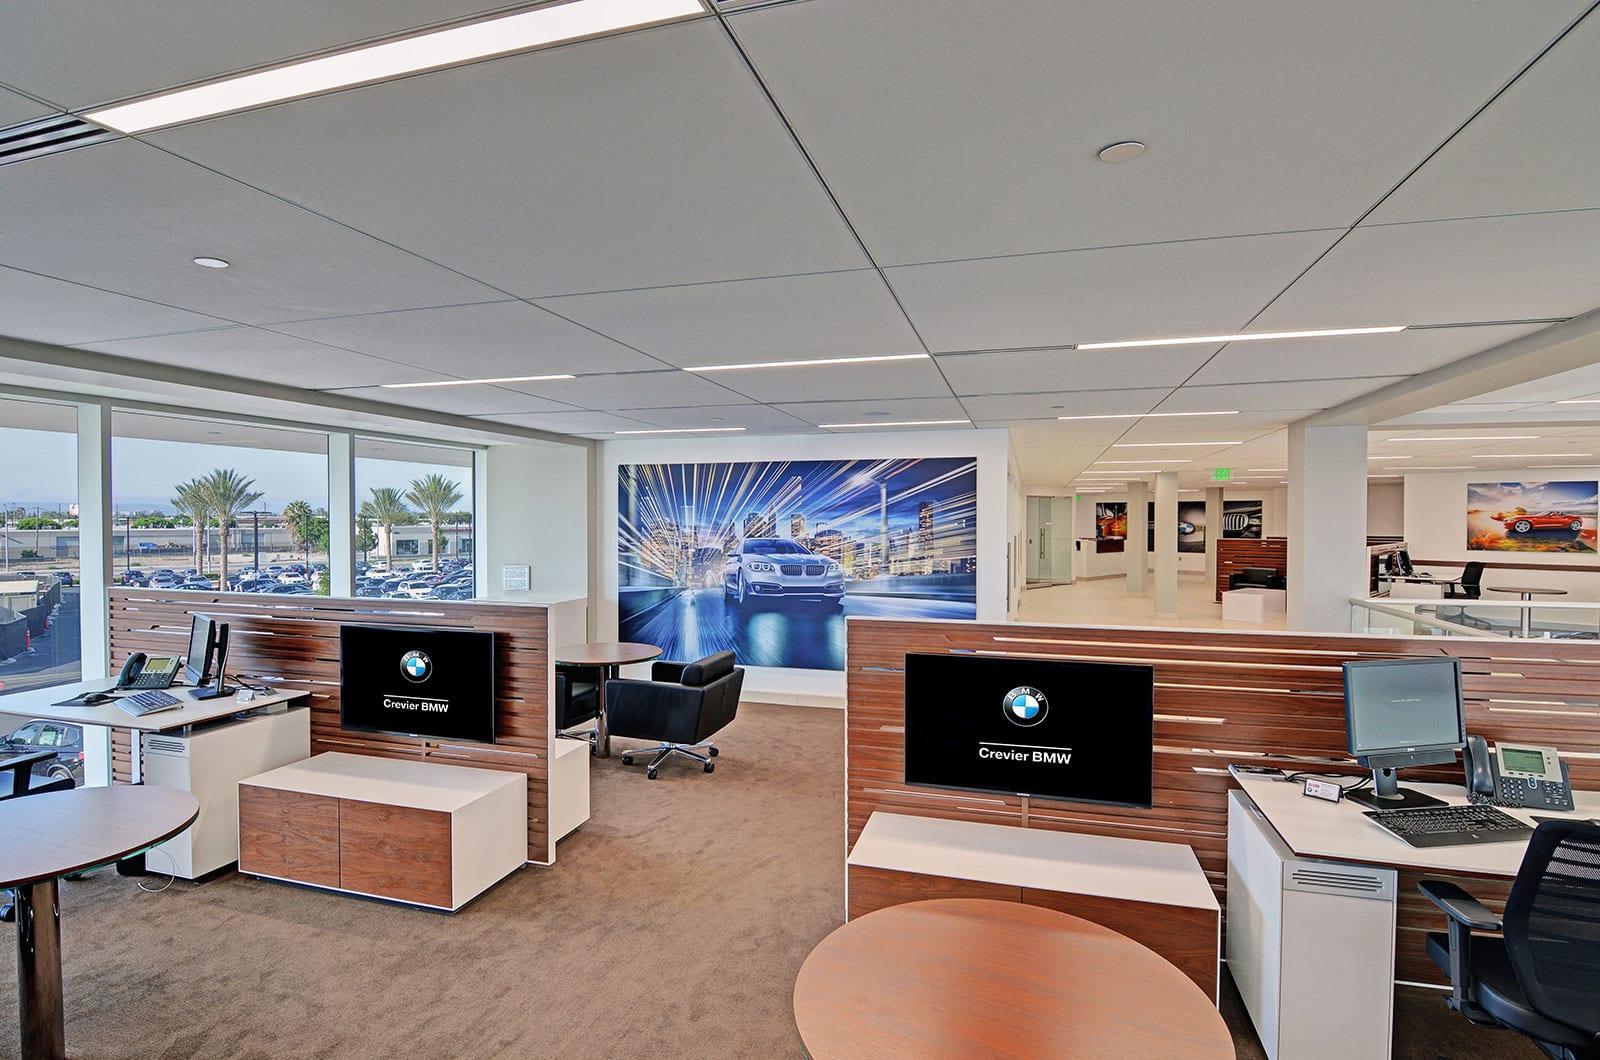 BMW-Auto-Dealership-Auto Dealership-Virtual-Tours-Car-Dealership-Virtual-Tours-Aerial-Photography-Services